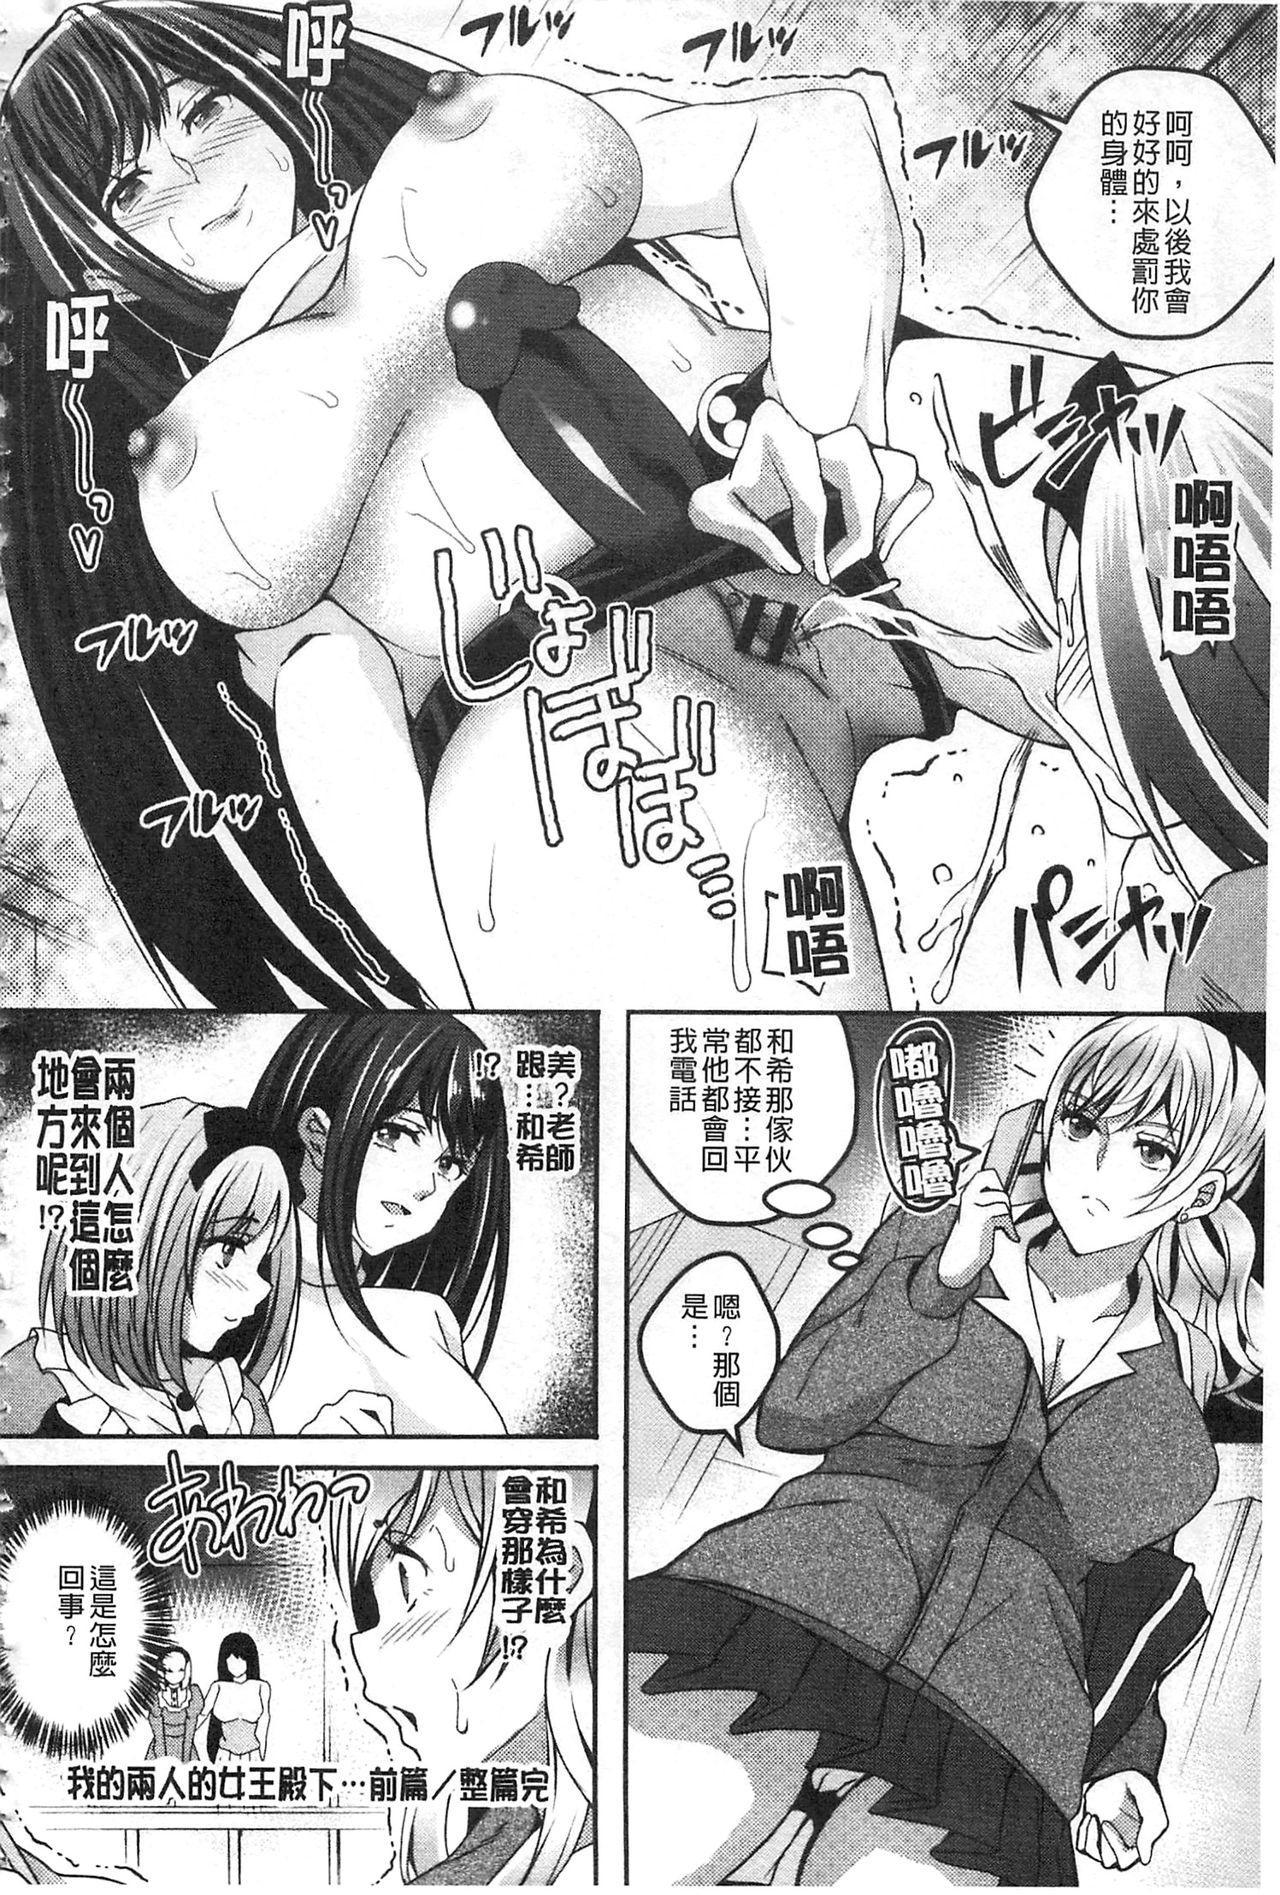 Kanjuku Otome no Odoshikata | 姦熟乙女的脅迫法 25